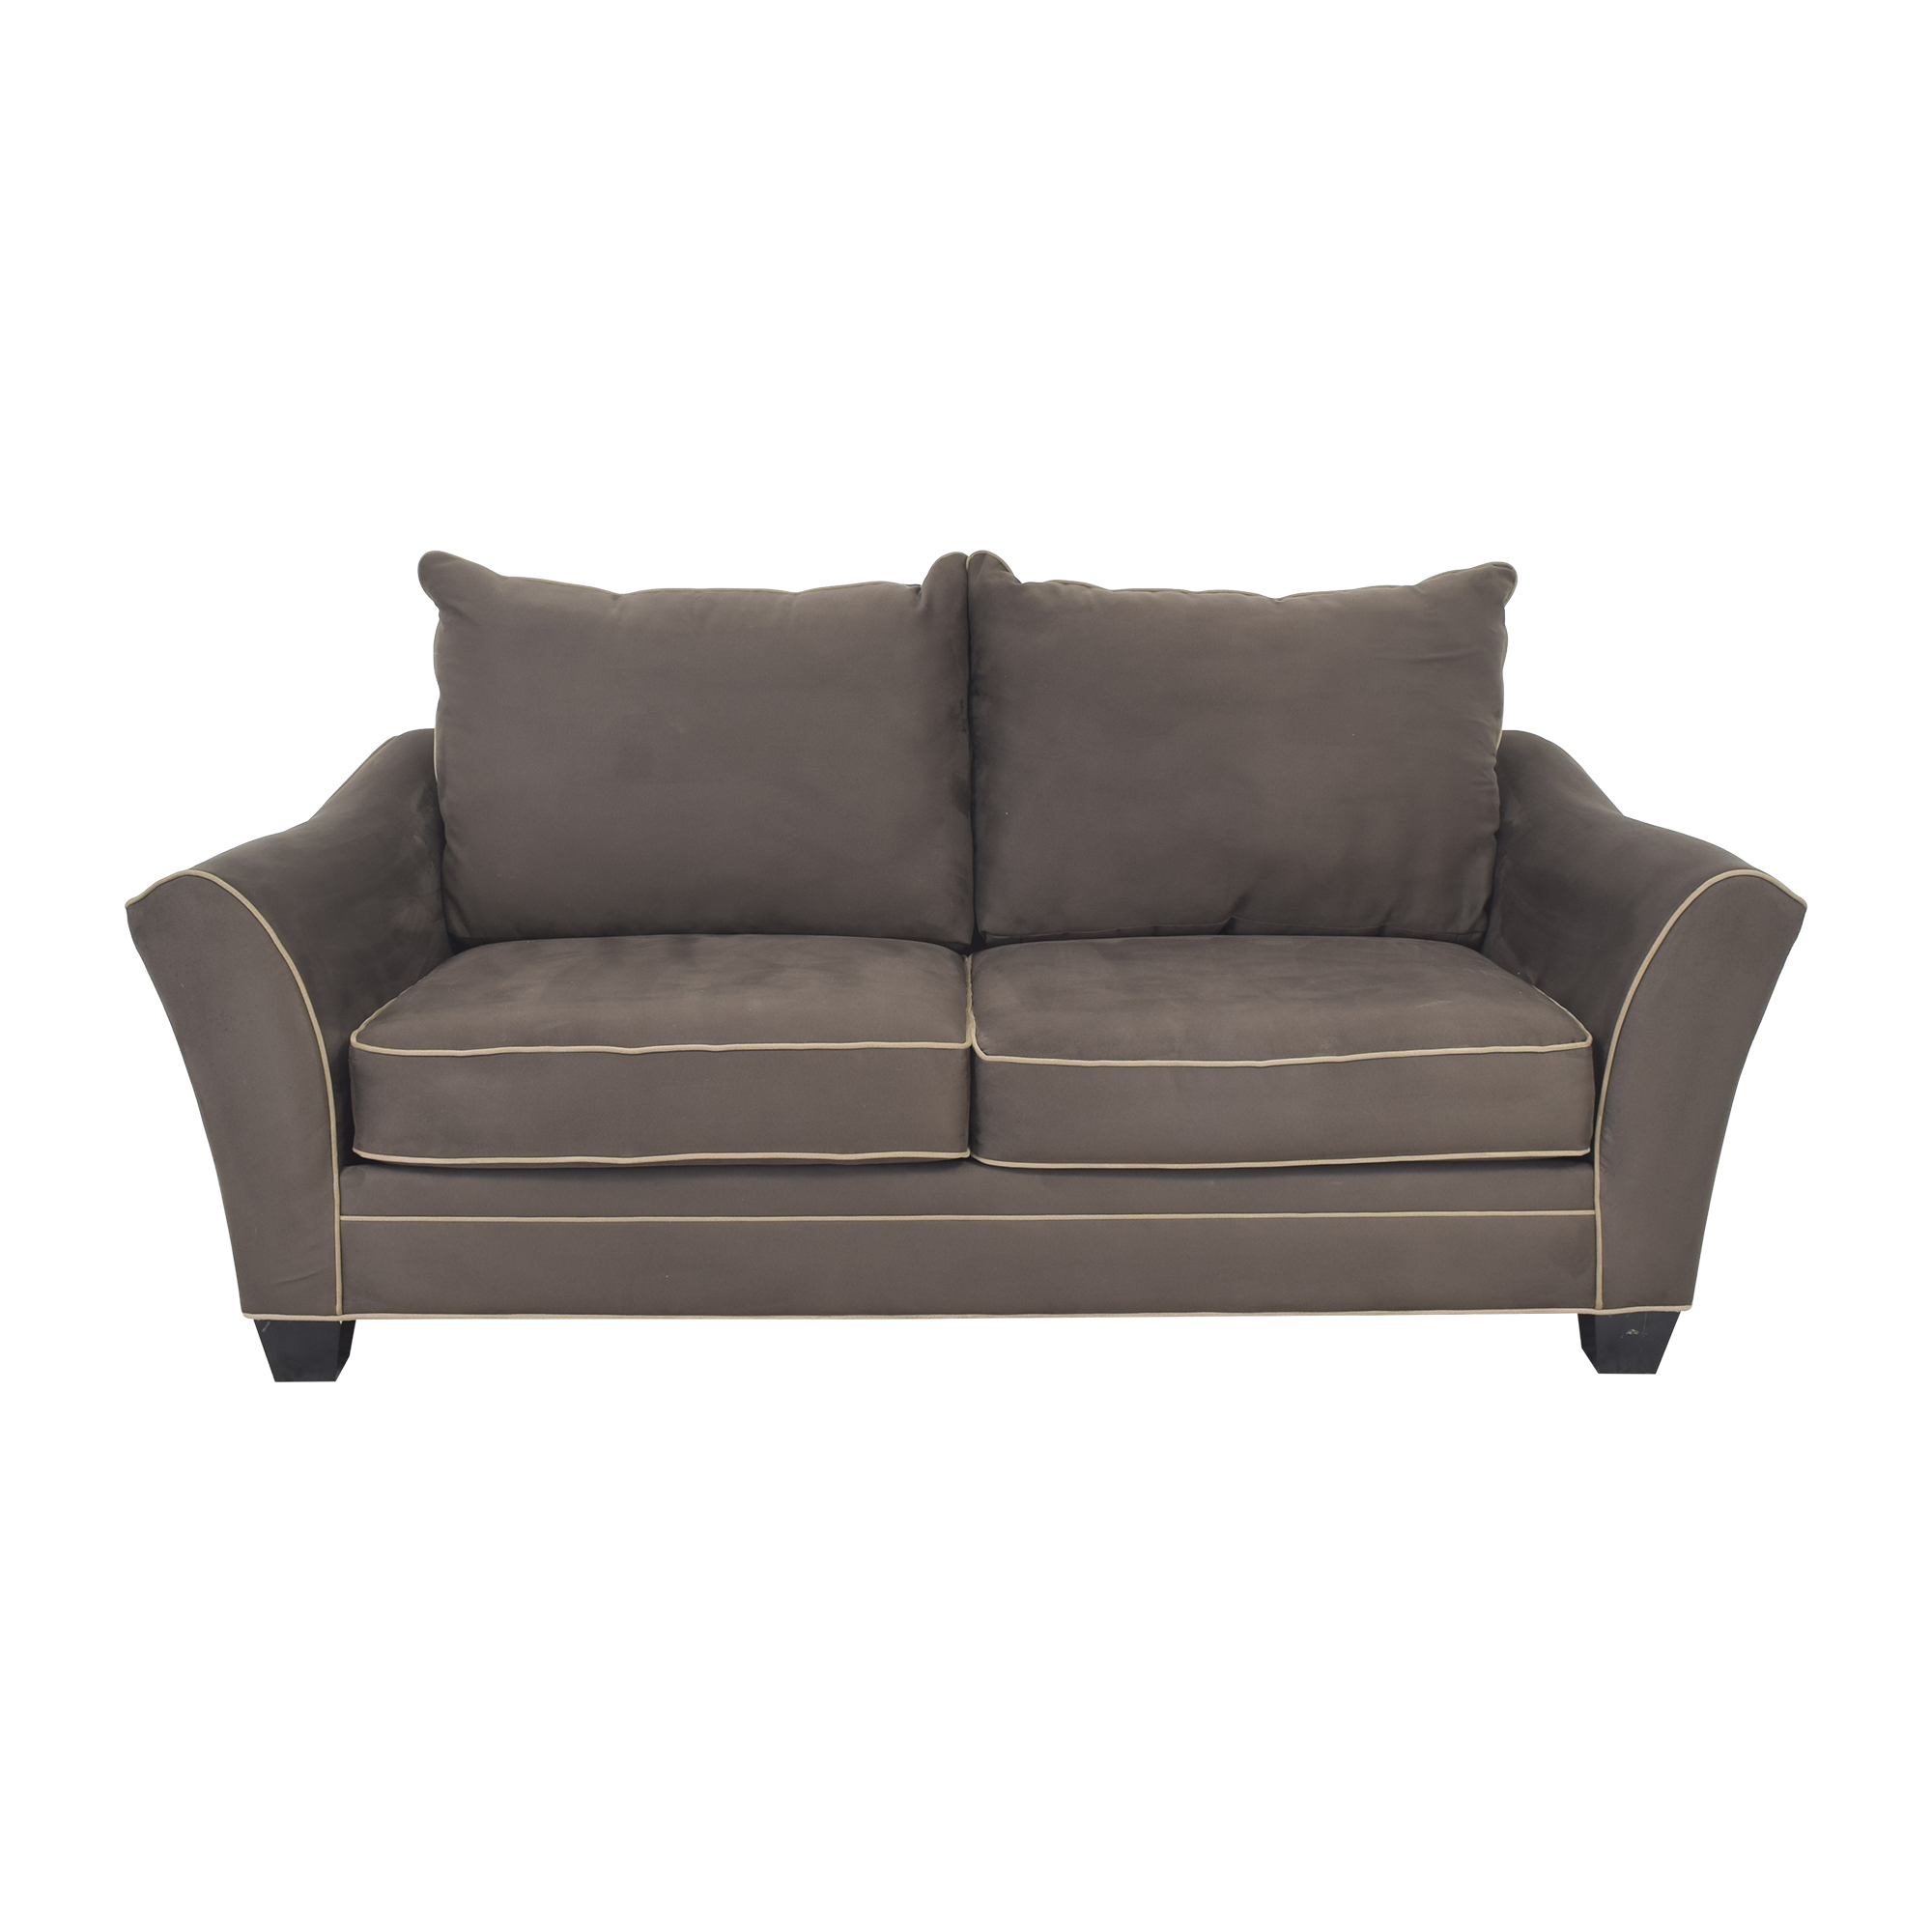 Raymour & Flanigan Raymour & Flanigan Tapered Arm Sofa used